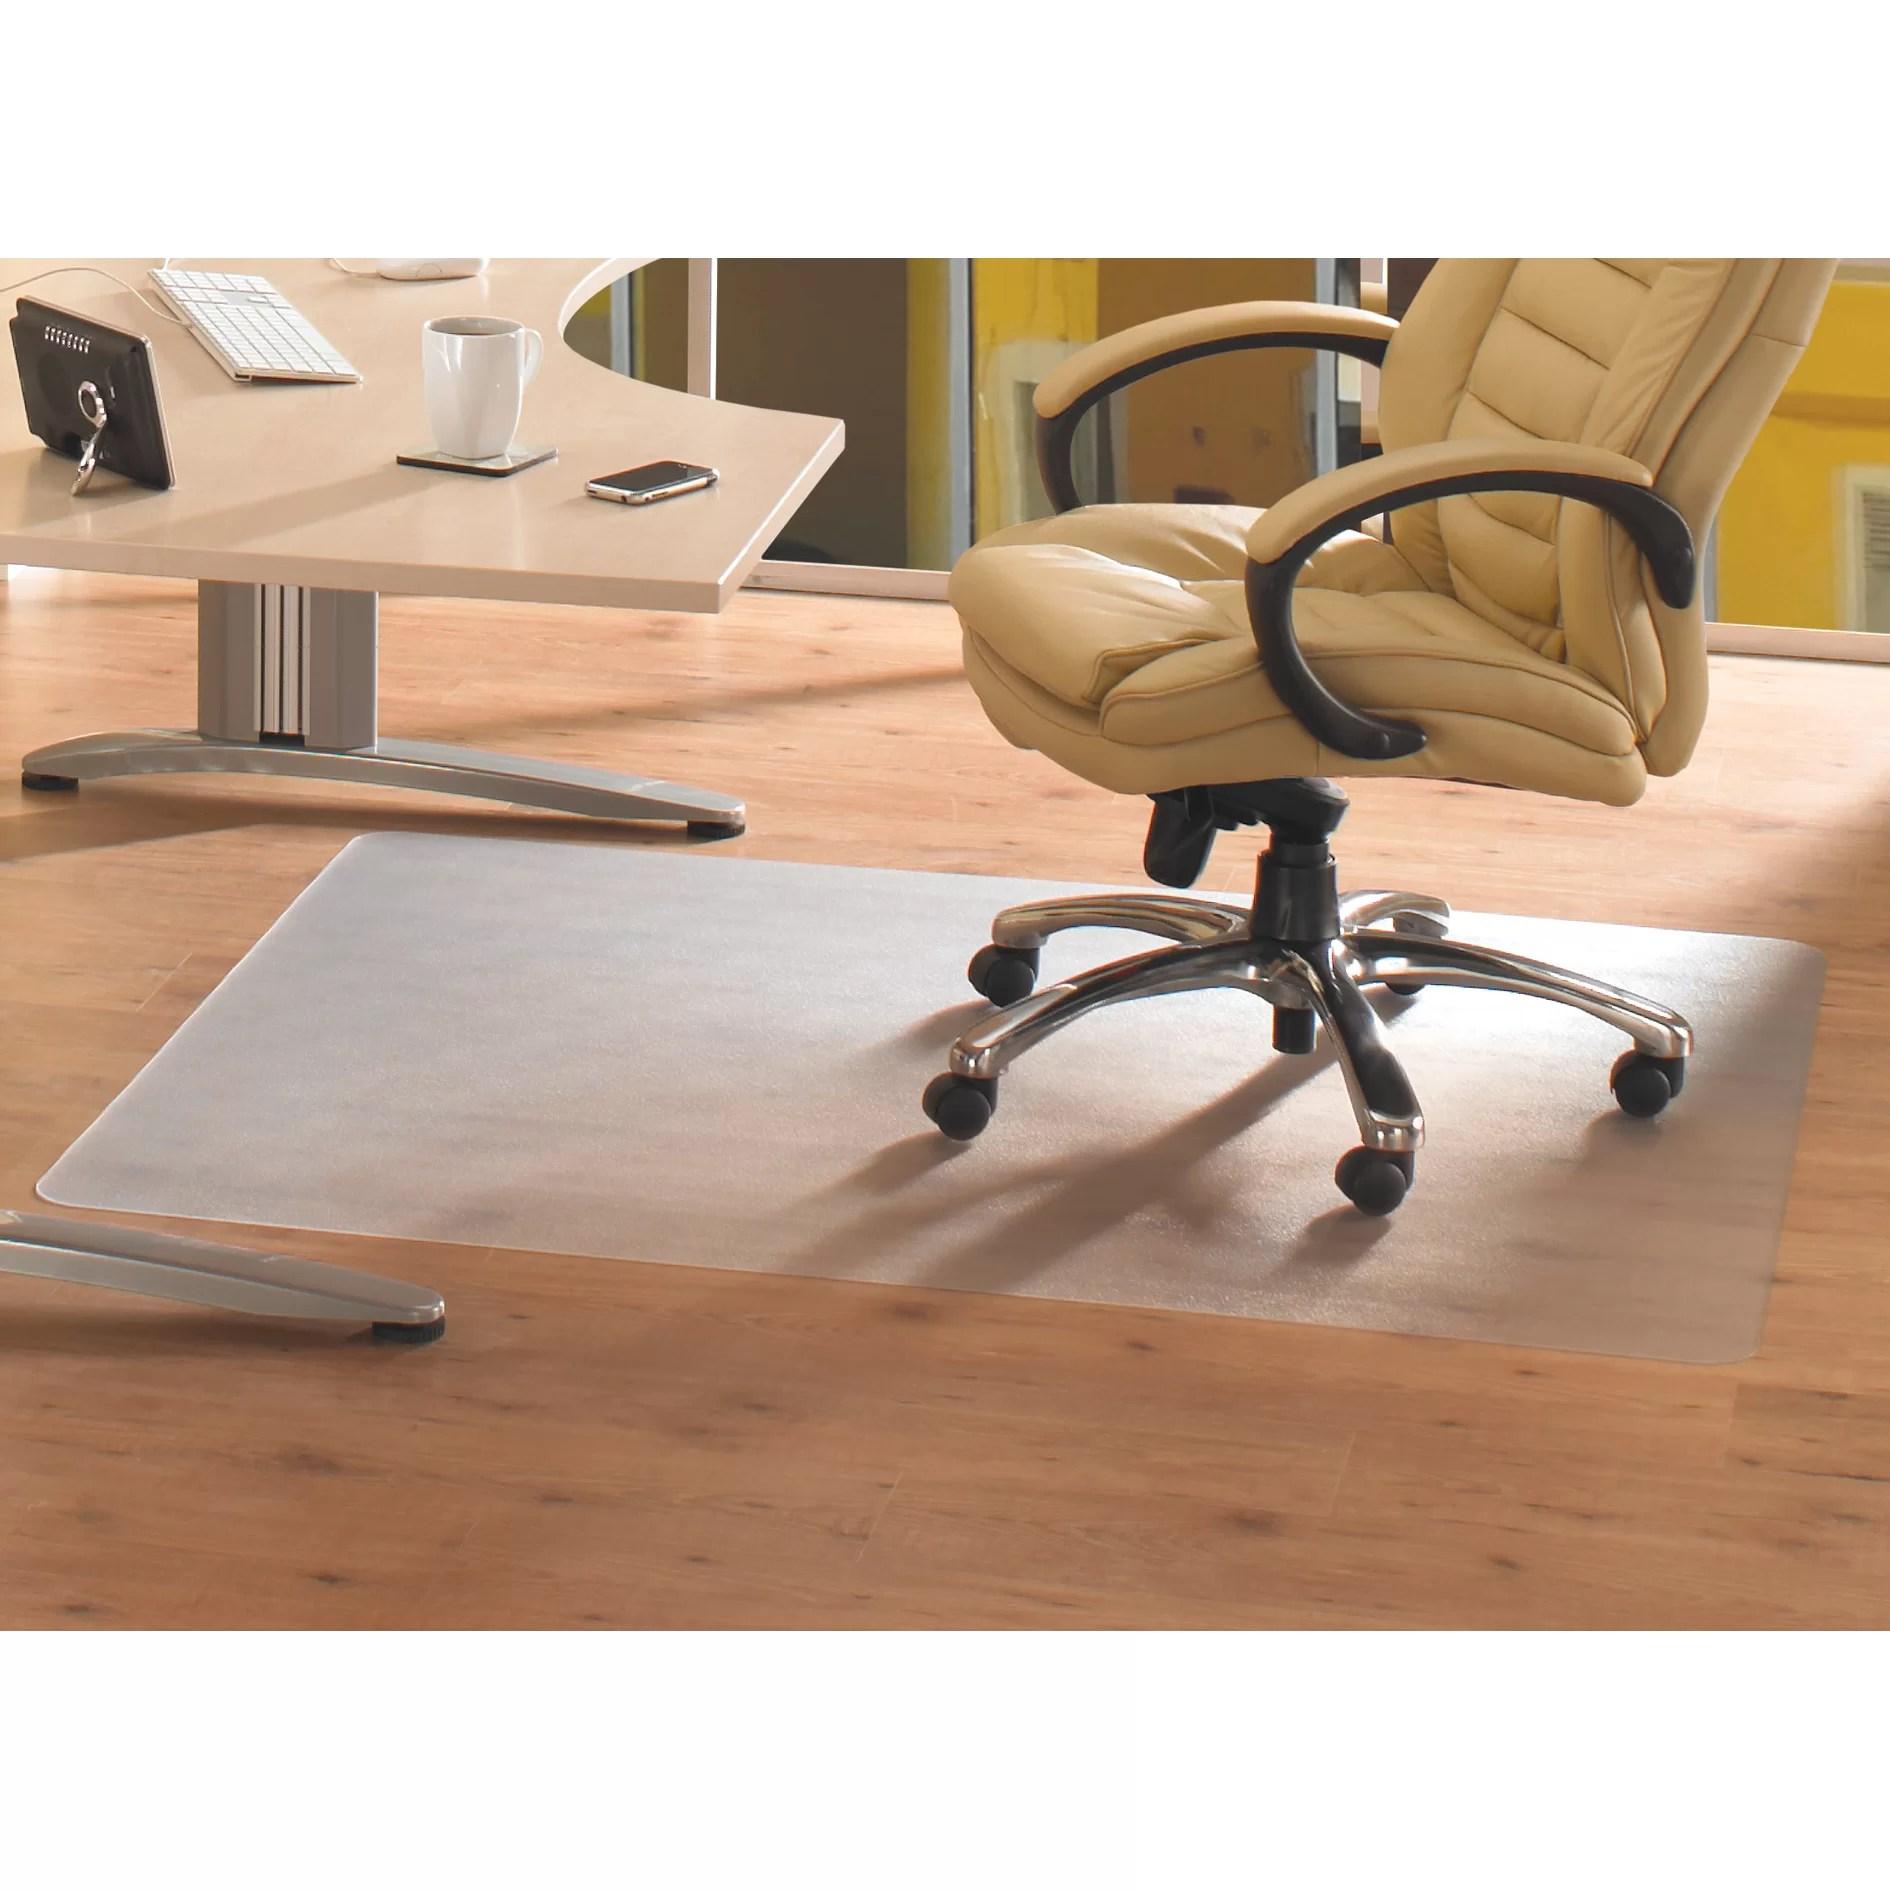 office chair mat 45 x 60 wheelchair gst floortex anti microbial advantagemat hard floor straight